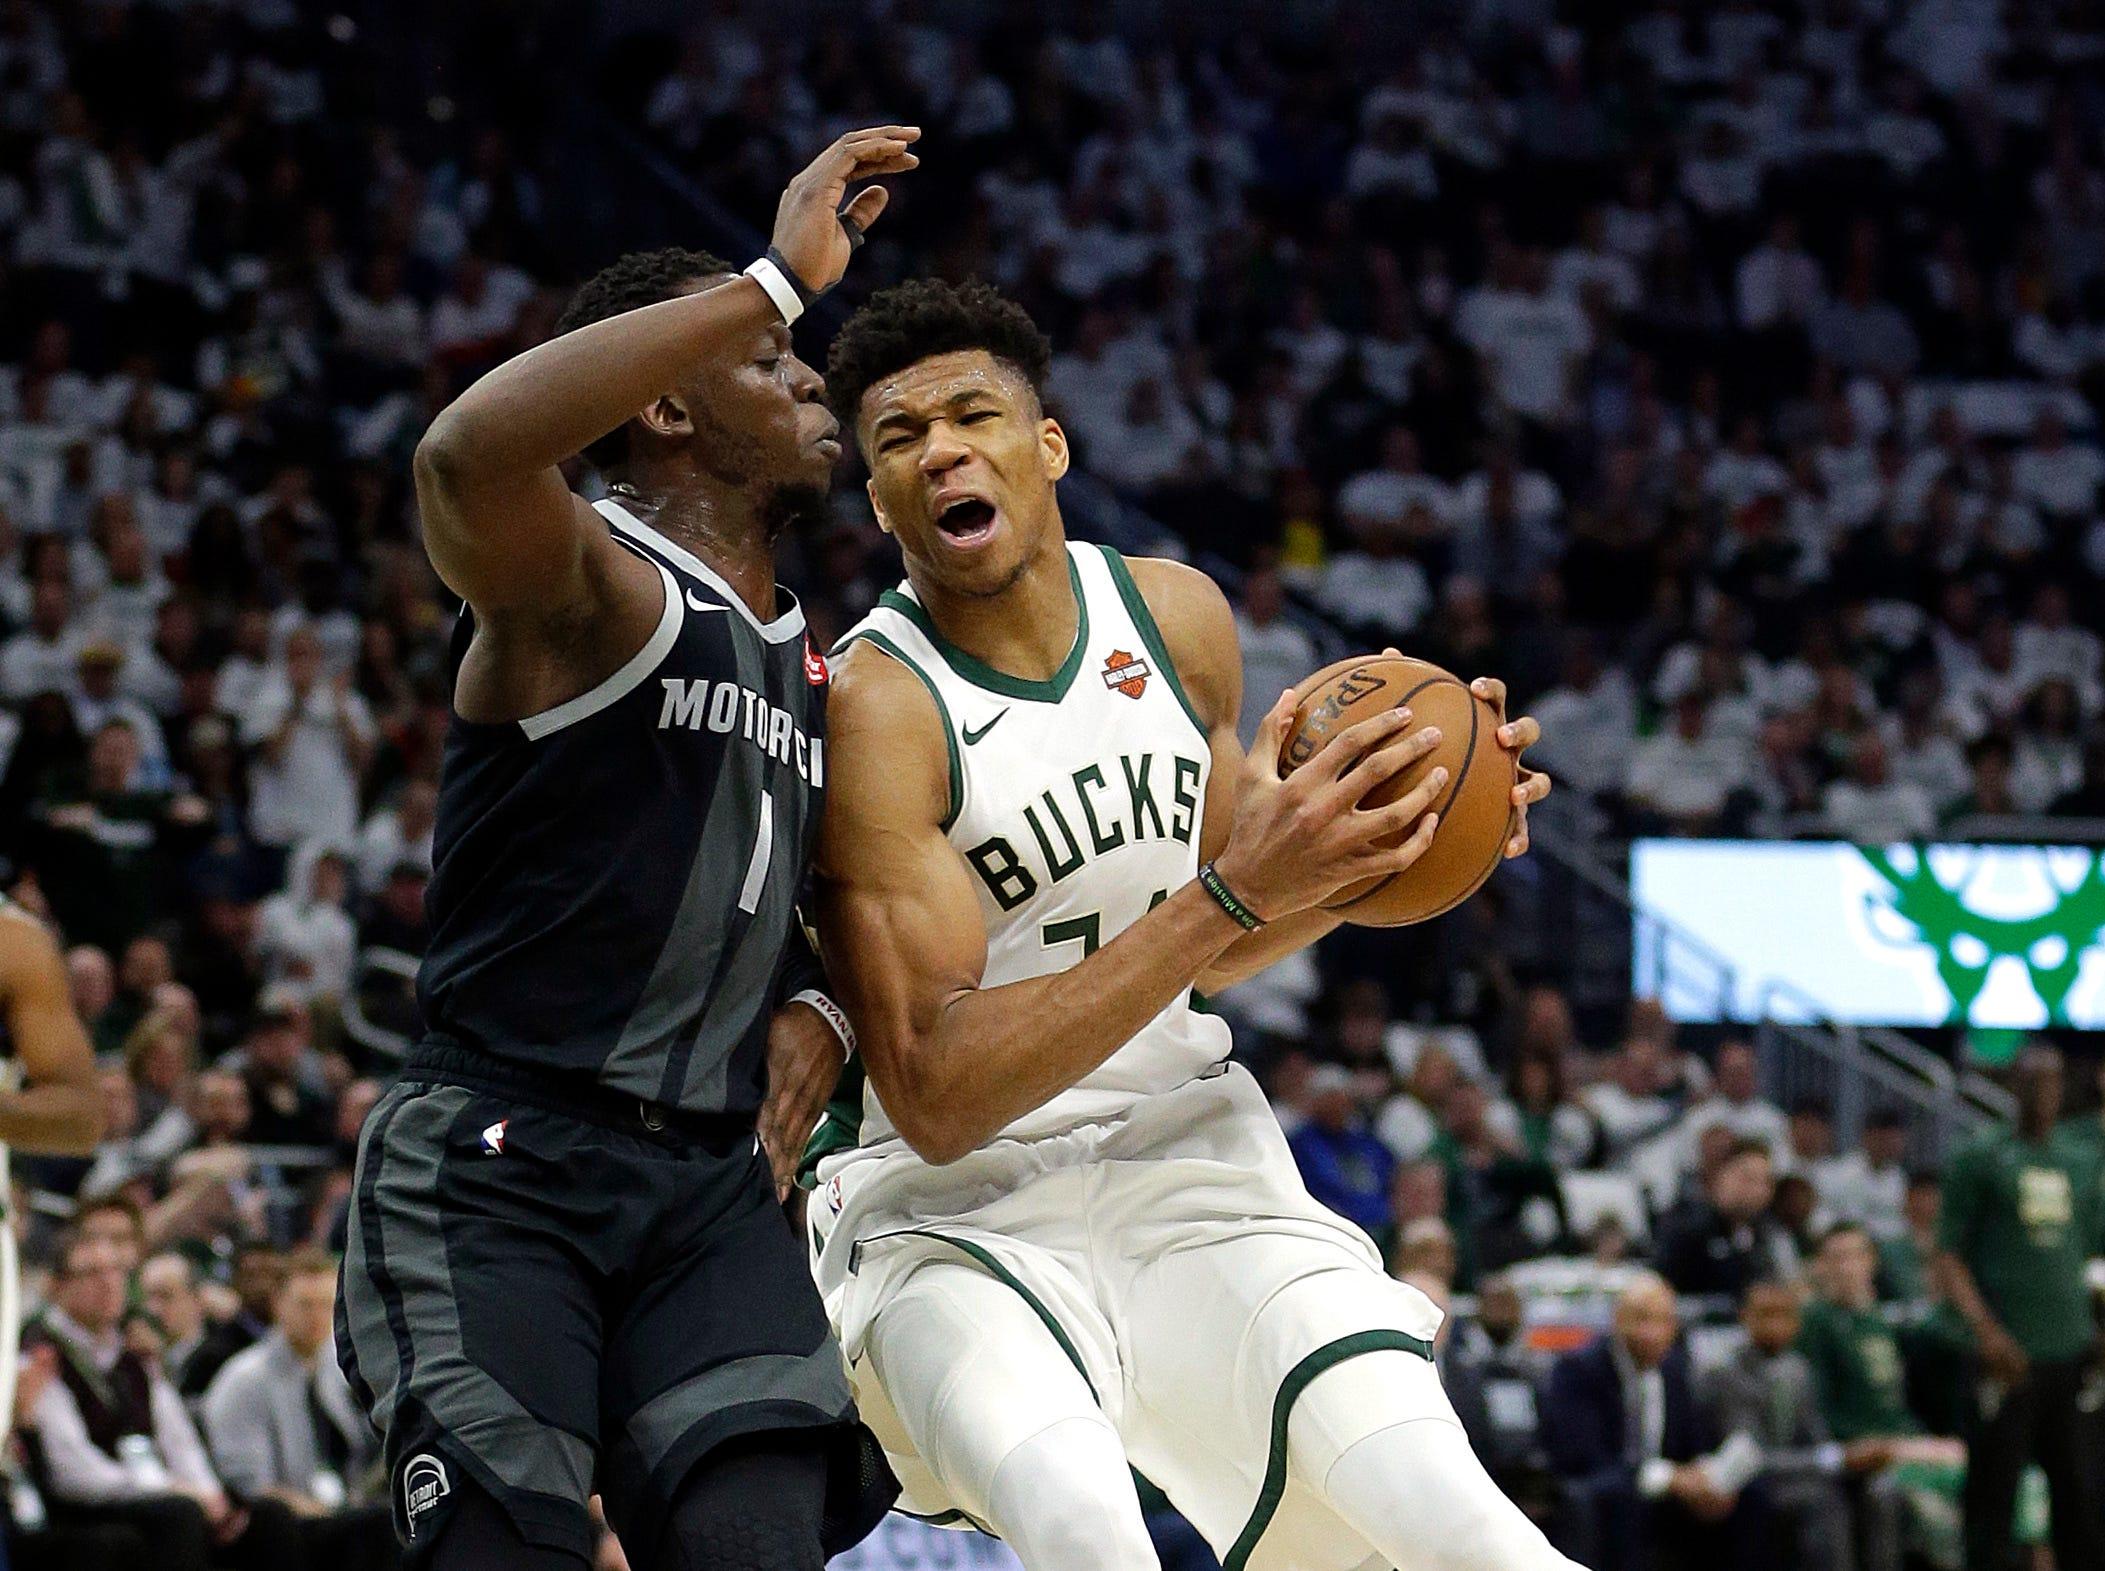 Milwaukee Bucks' Giannis Antetokounmpo drives to the basket against Detroit Pistons' Reggie Jackson during the second half.